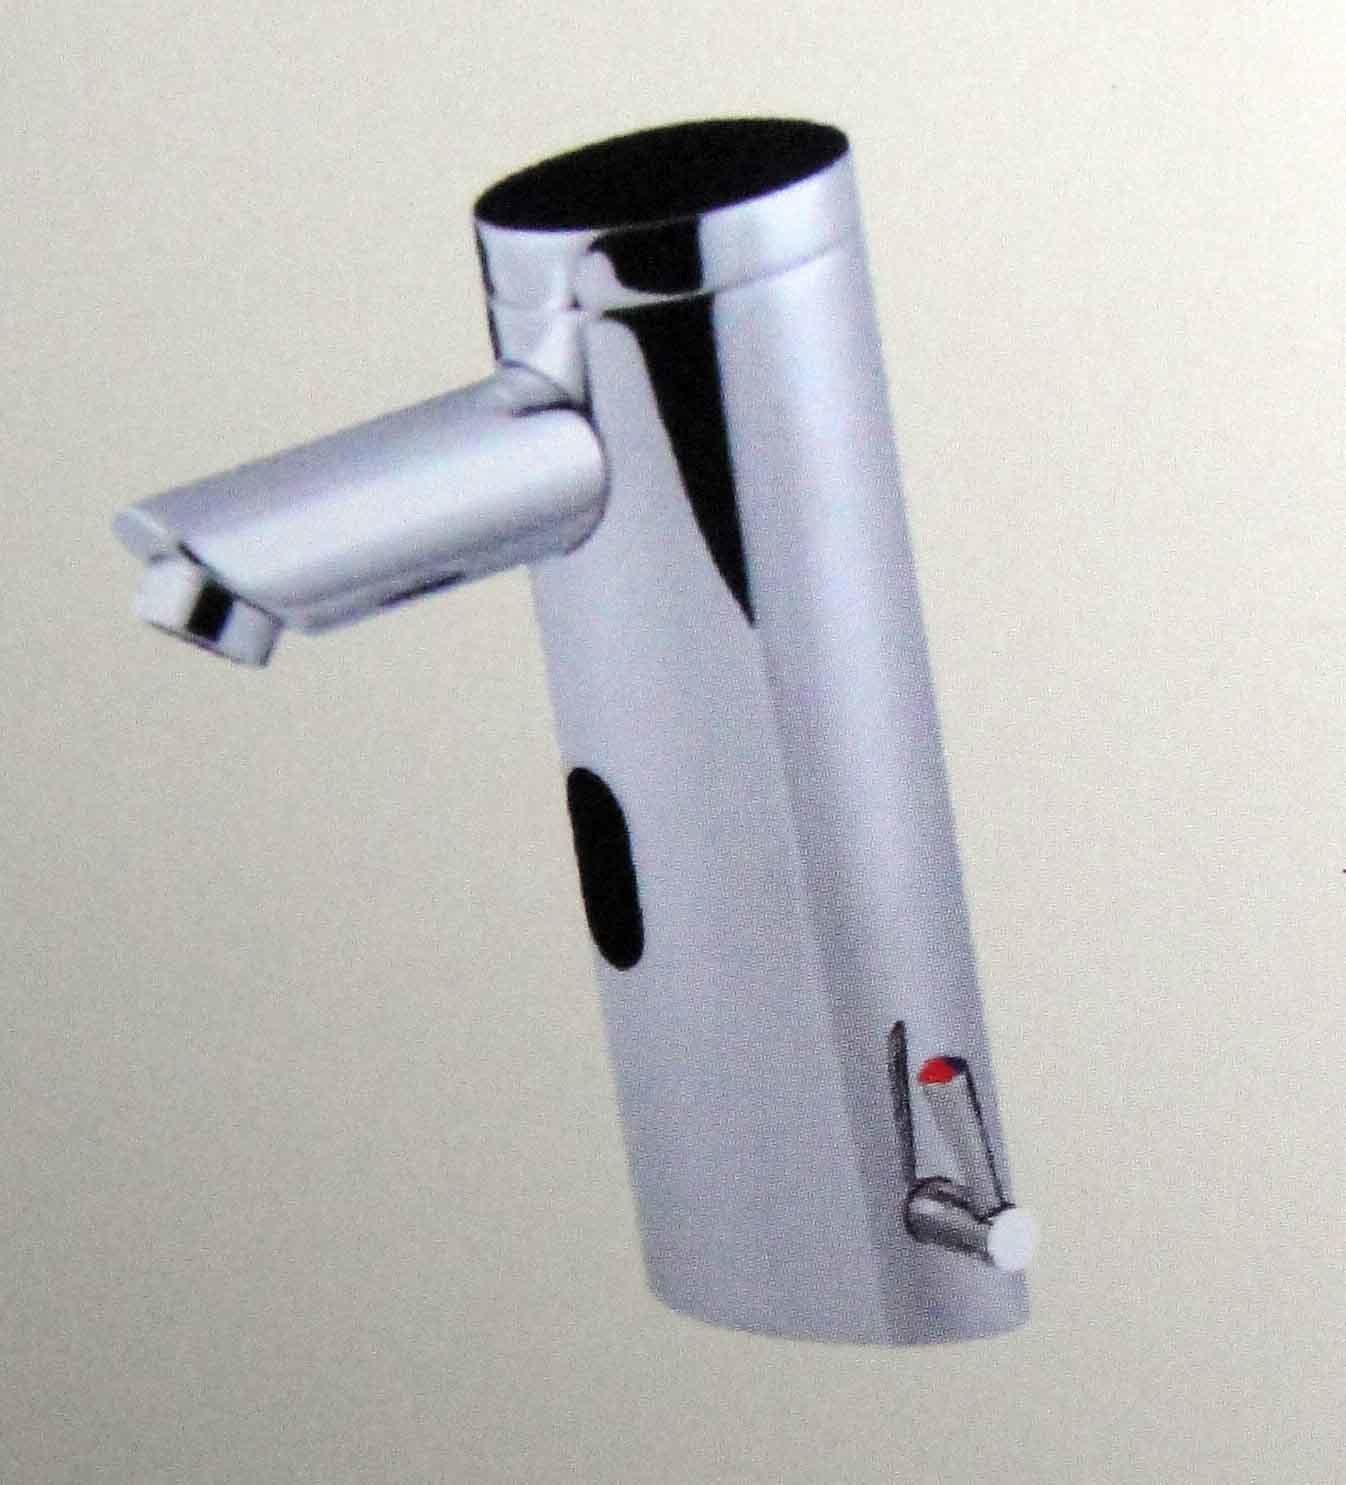 China automatic faucet xr8805 china automatic faucet automatic mixer - Automatic kitchen faucet ...